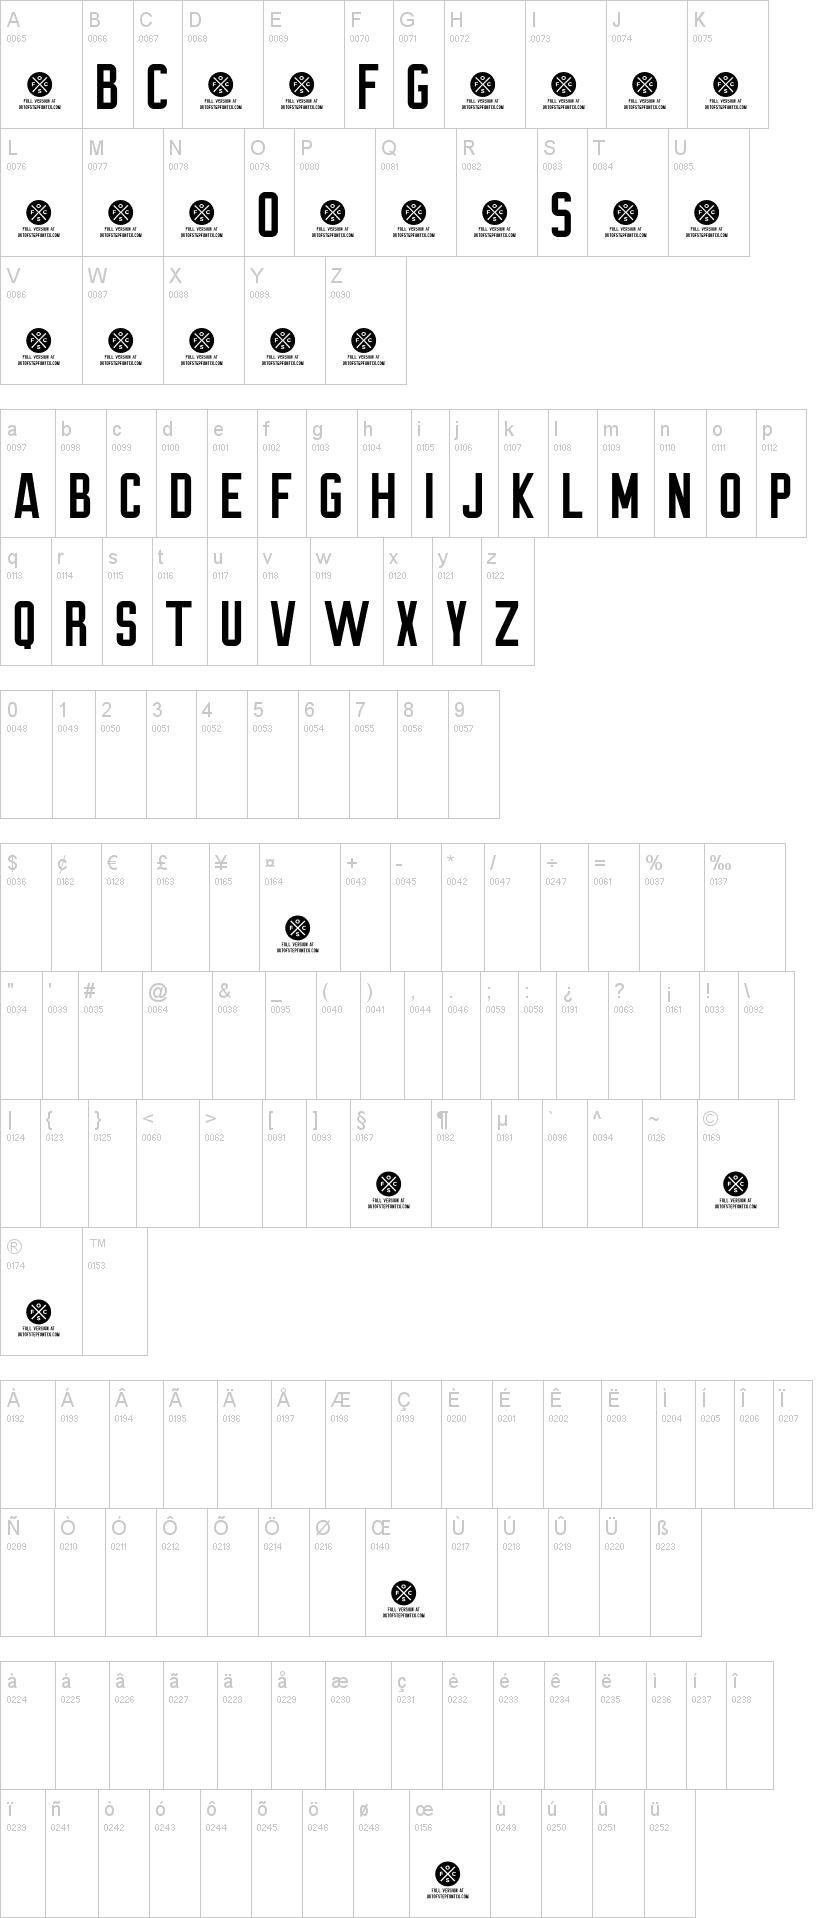 Brewmaster Gothic Font | dafont.com